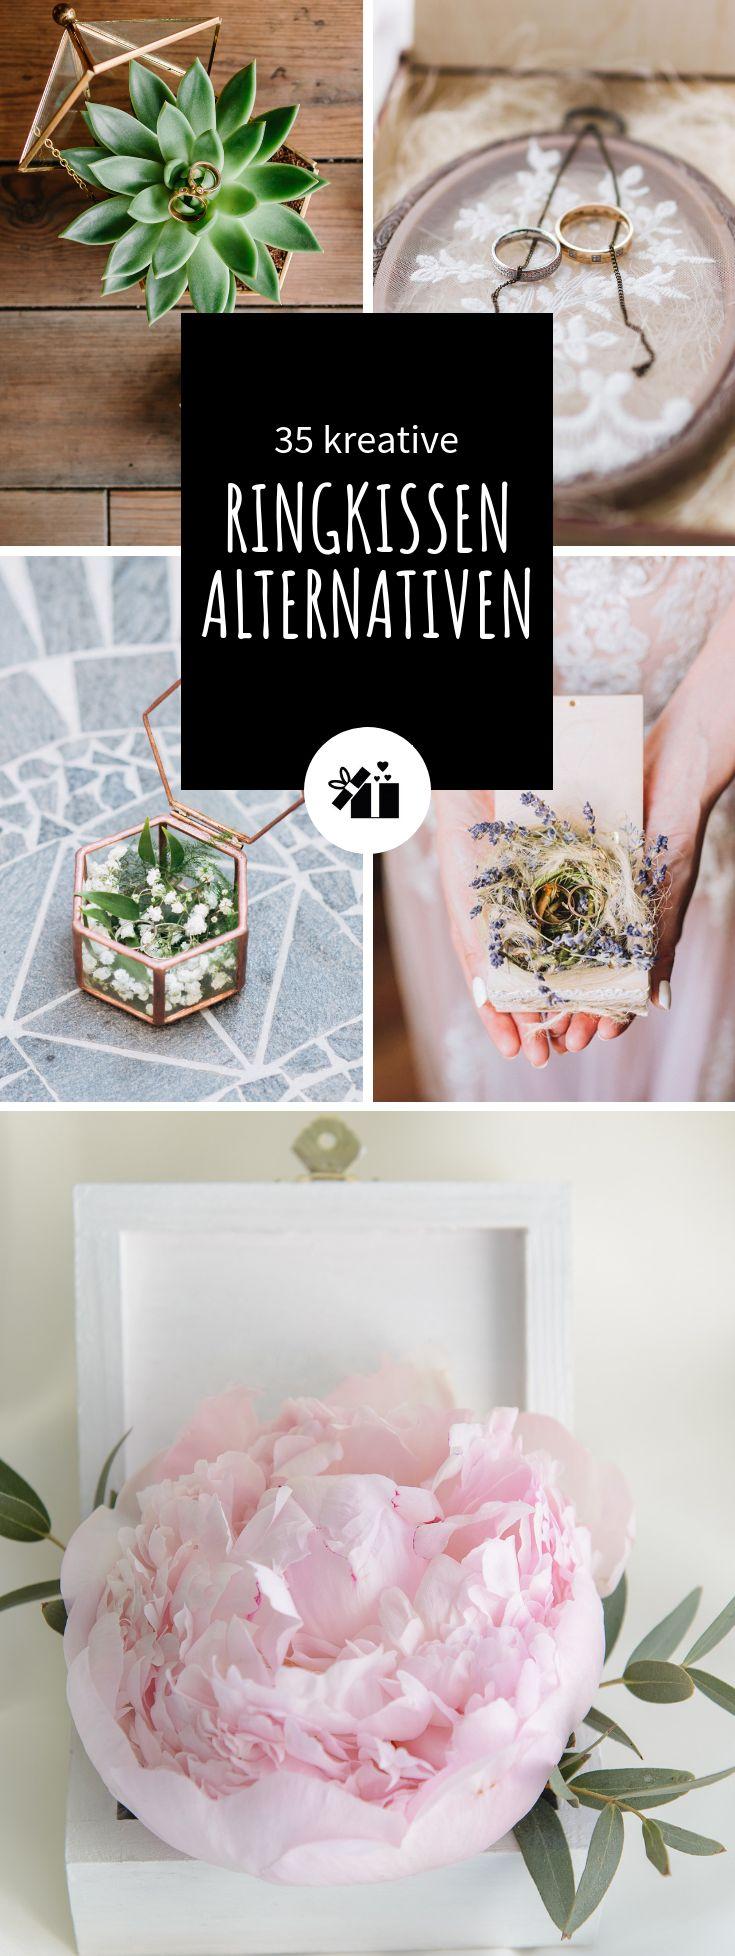 35 kreative Ringkissen-Alternativen